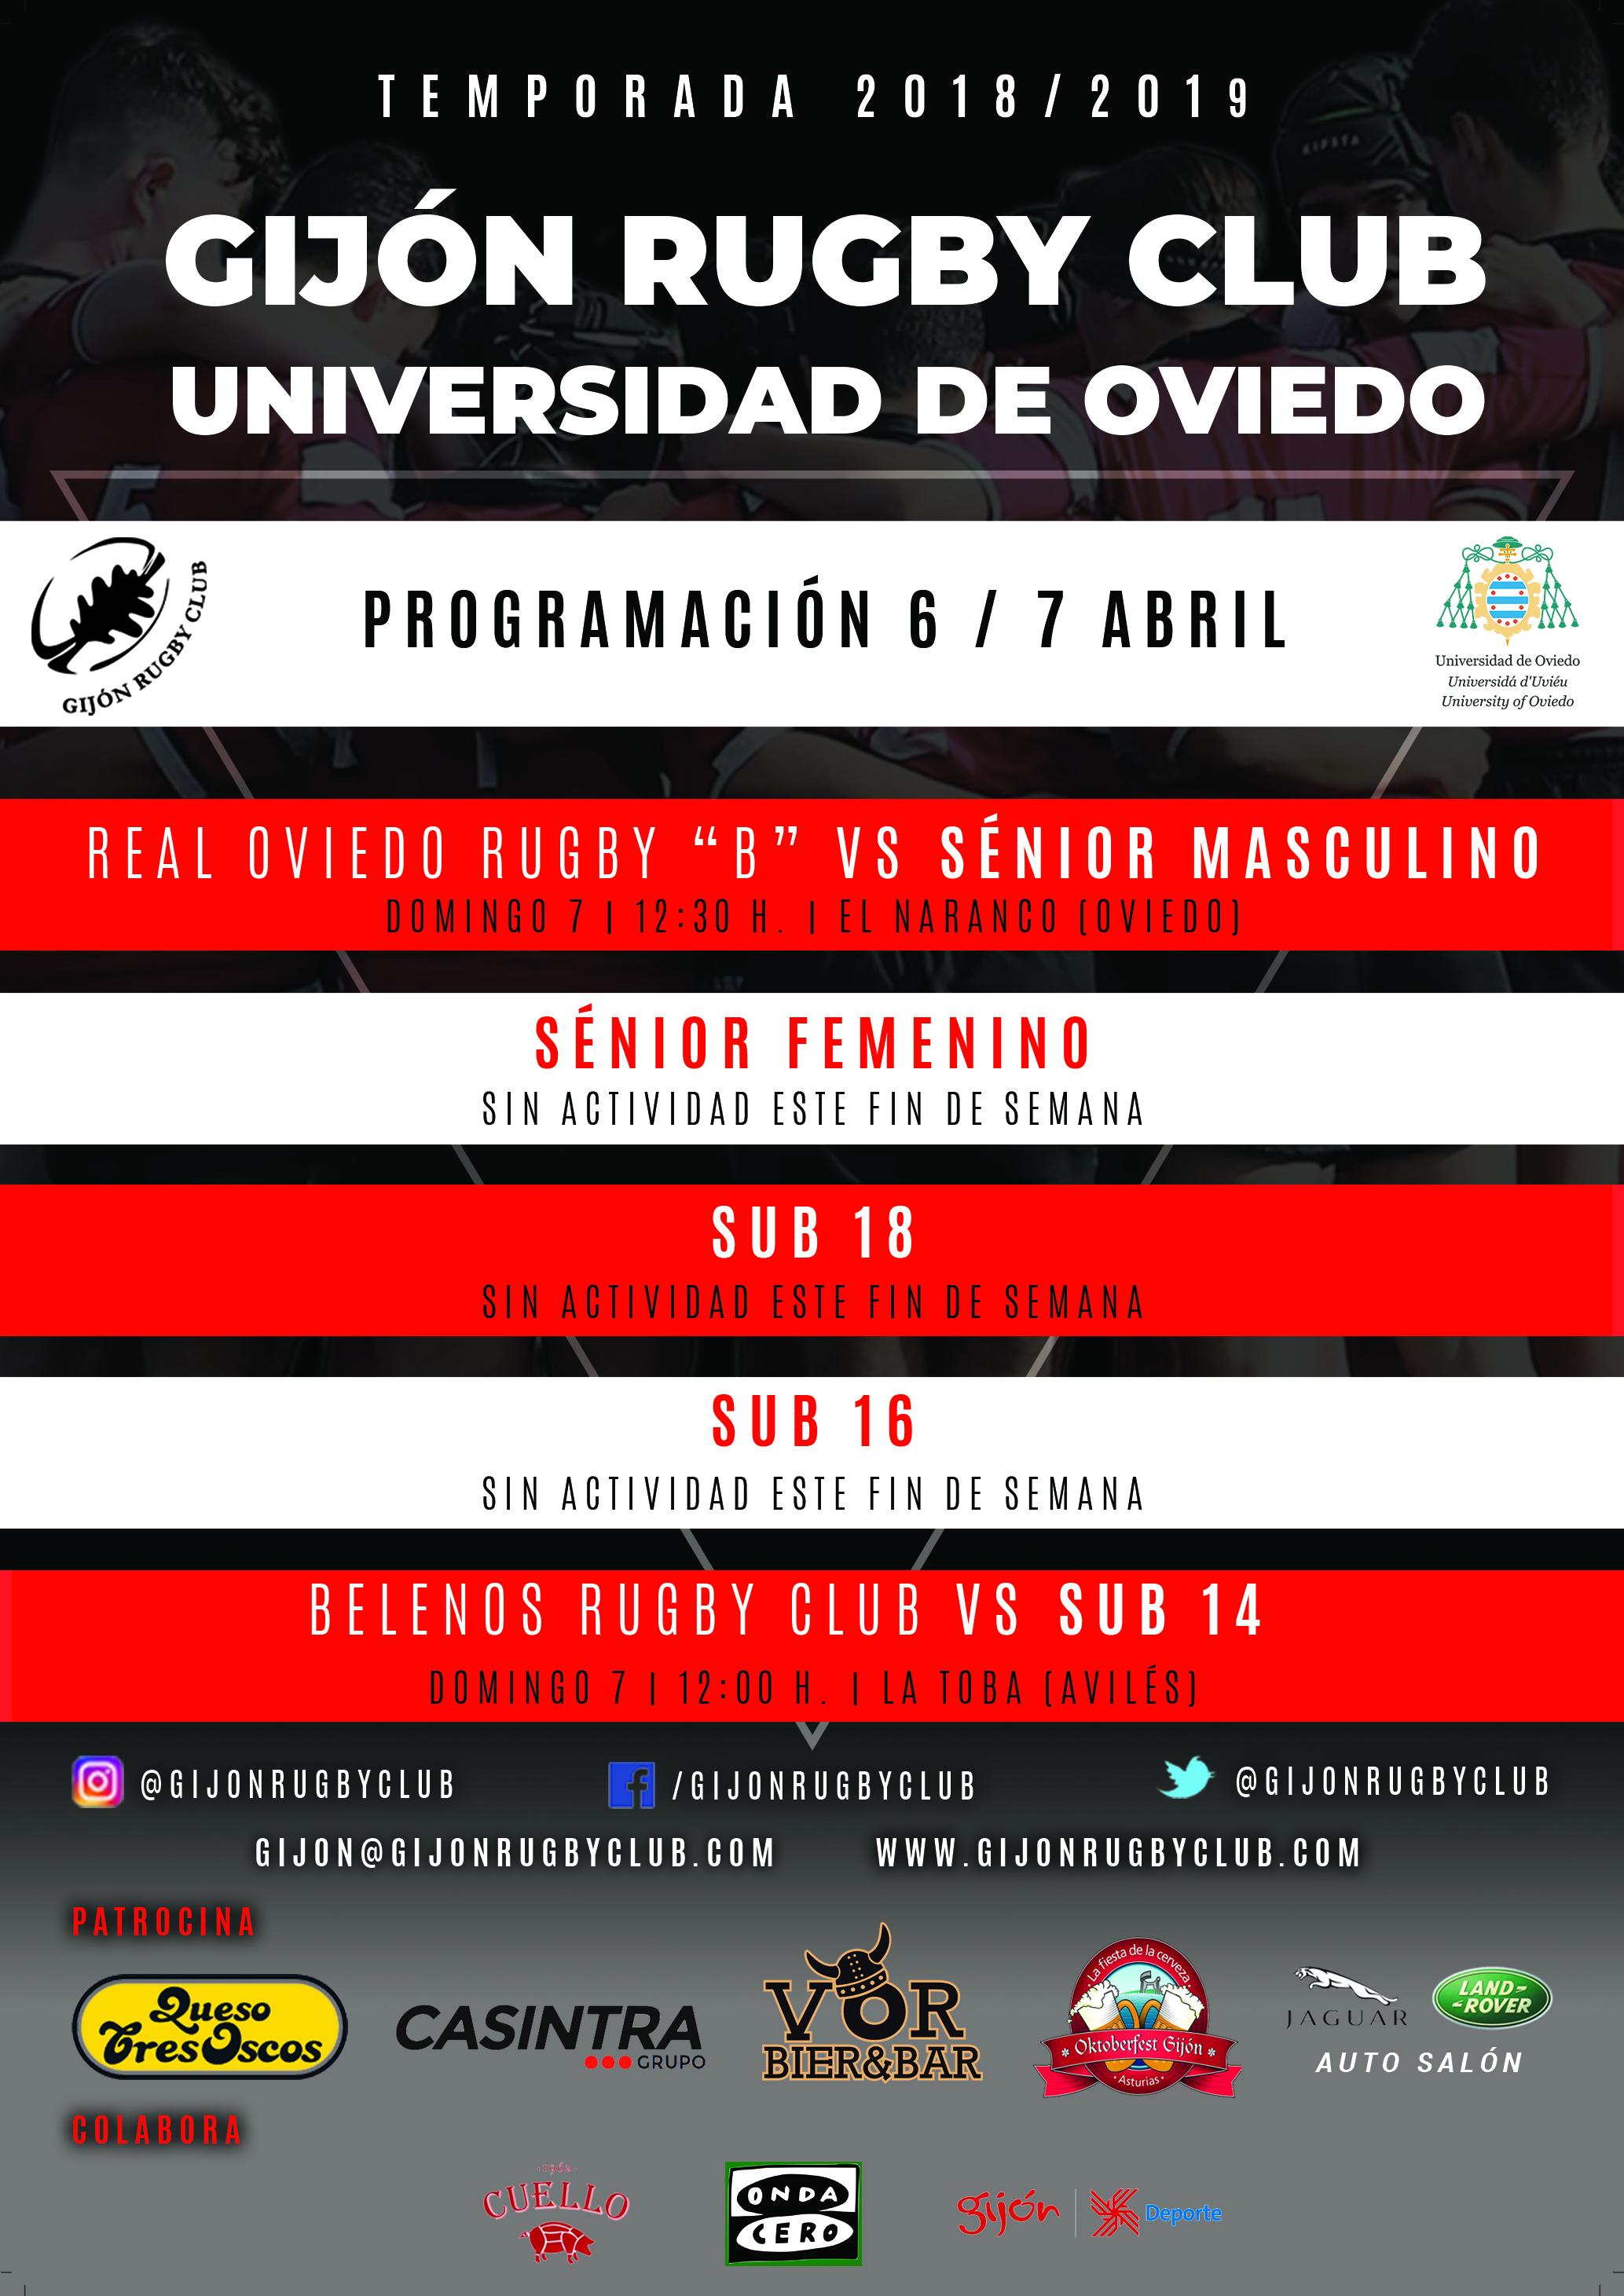 Calendario Laboral Oviedo 2019.Gijon Rugby Club Universidad De Oviedo